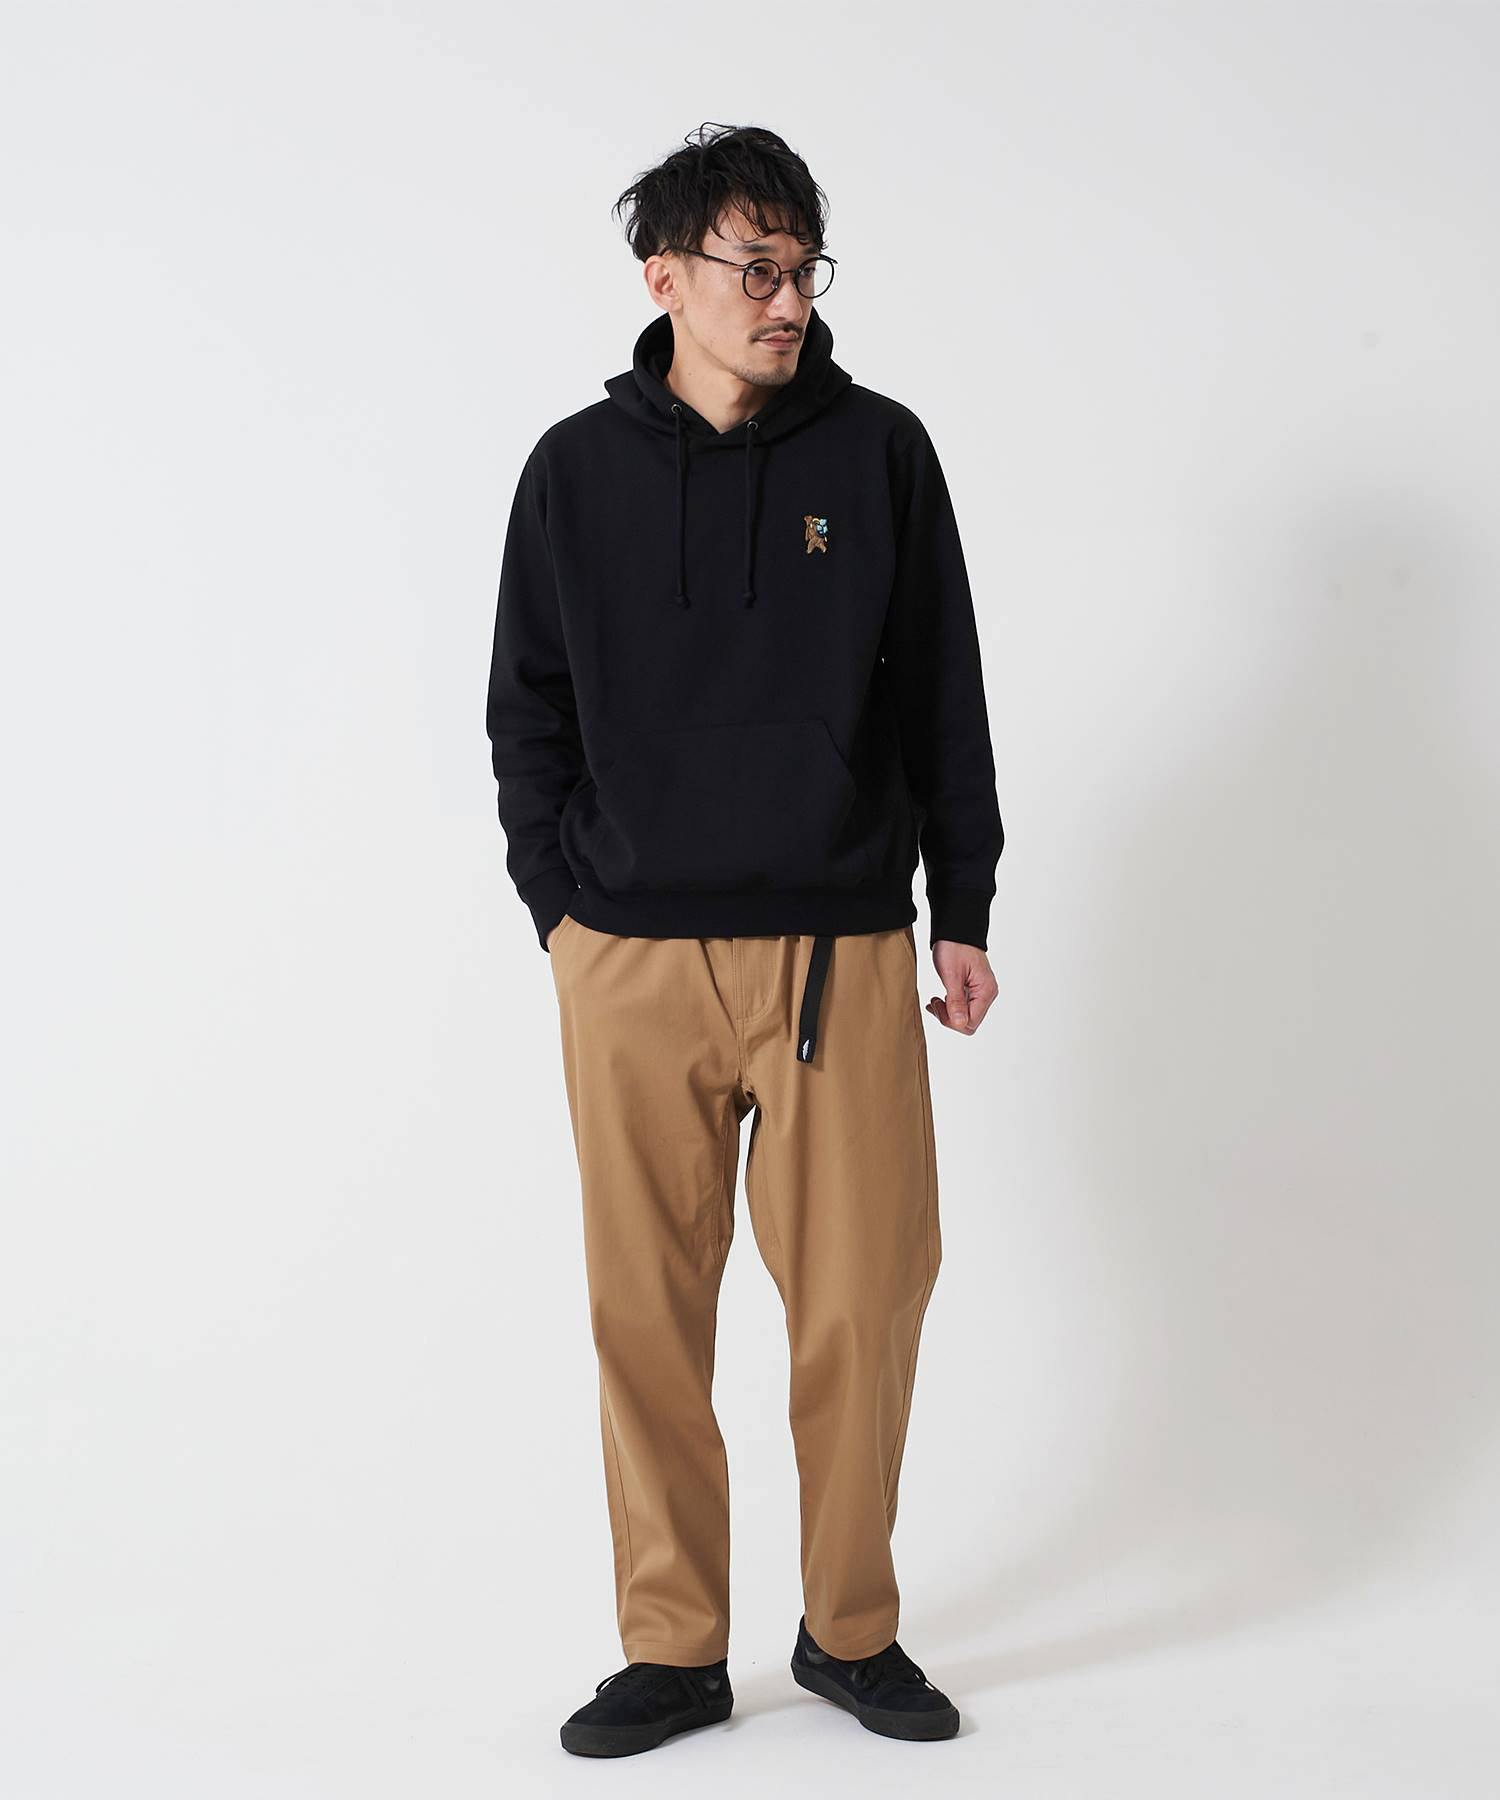 OUTDOOR PRODUCTS APPAREL ツイルリラックスフィットシャツ